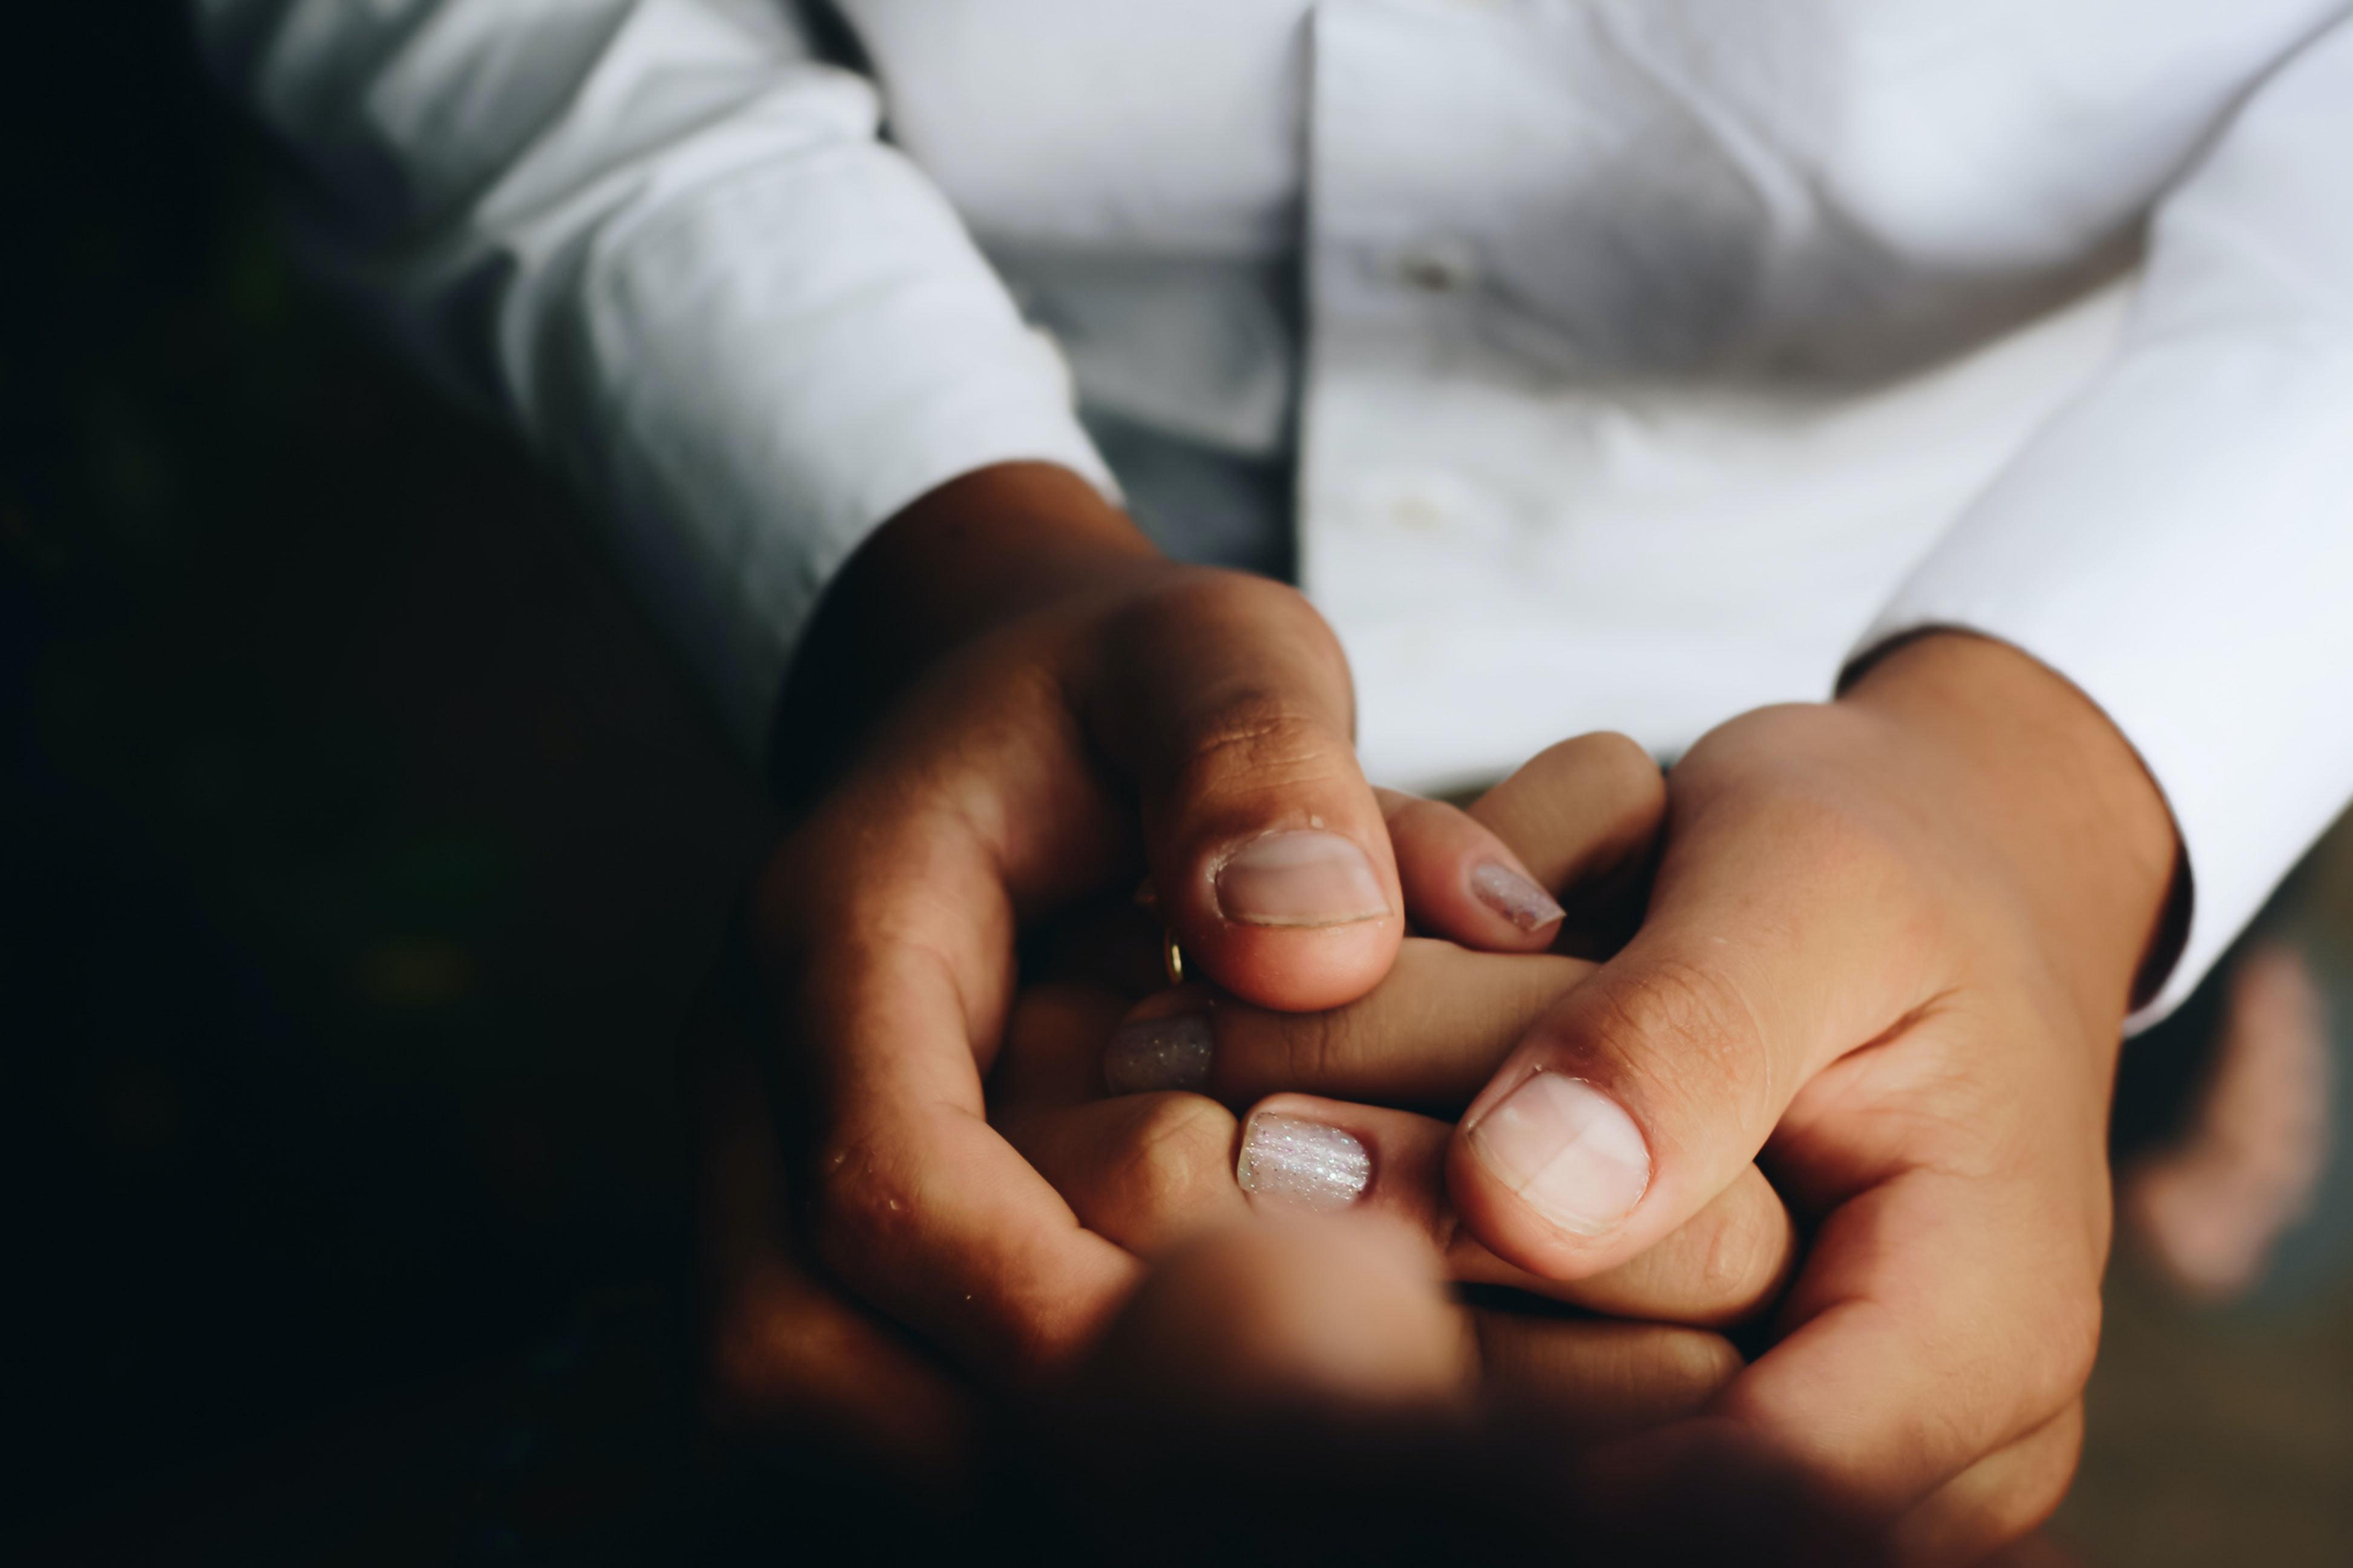 People holding hands; image by Matheus Ferrero, via Unsplash.com.